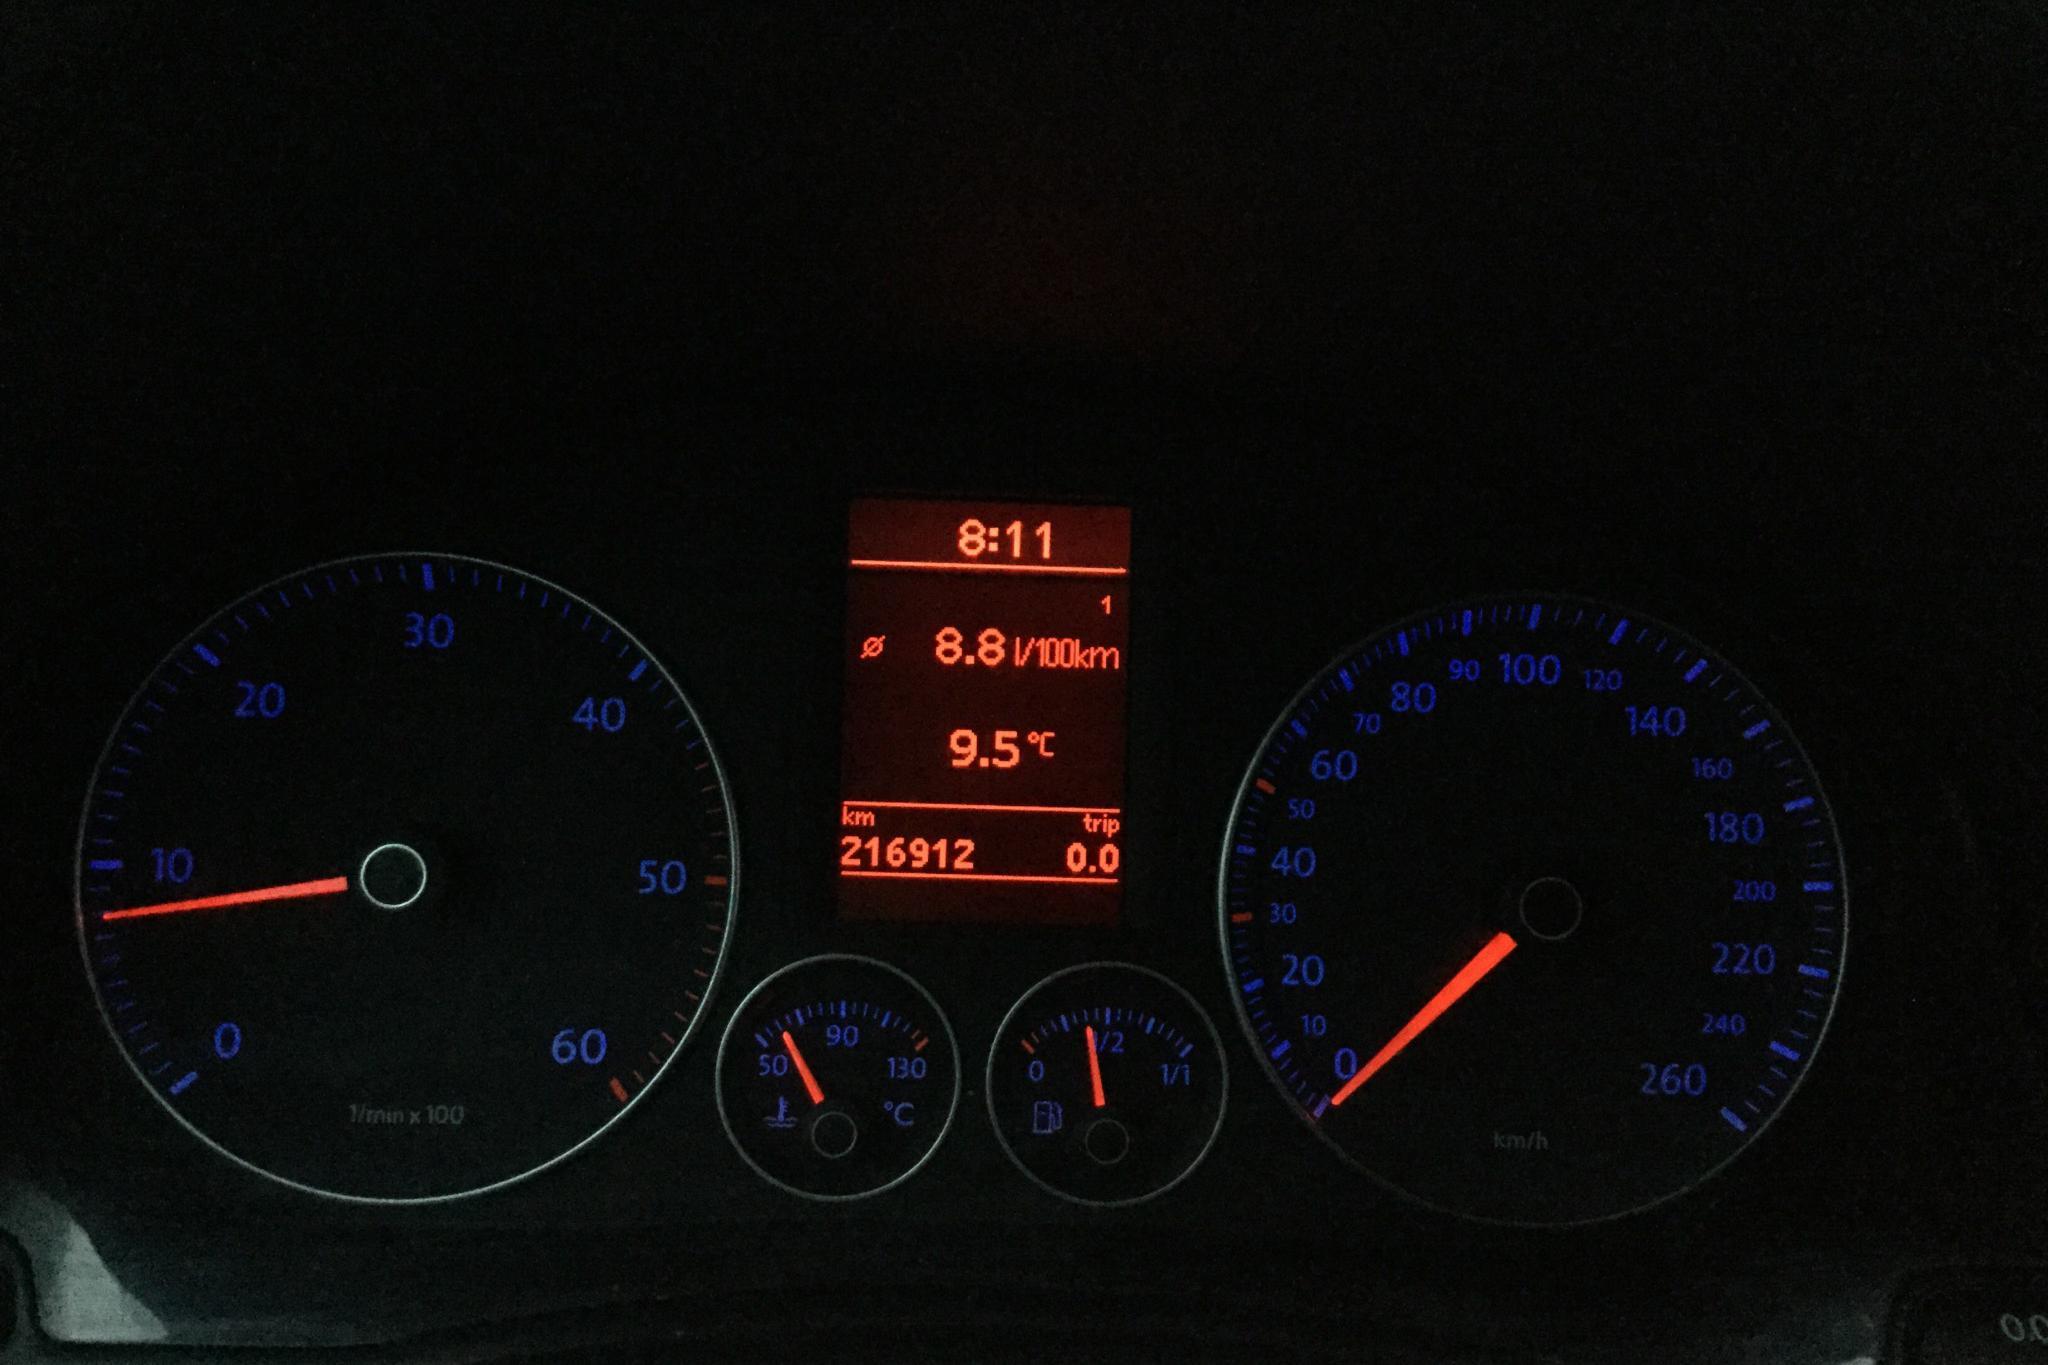 VW Golf A5 1.9 TDI BlueMotion 5dr (105hk) - 21 691 mil - Manuell - silver - 2008